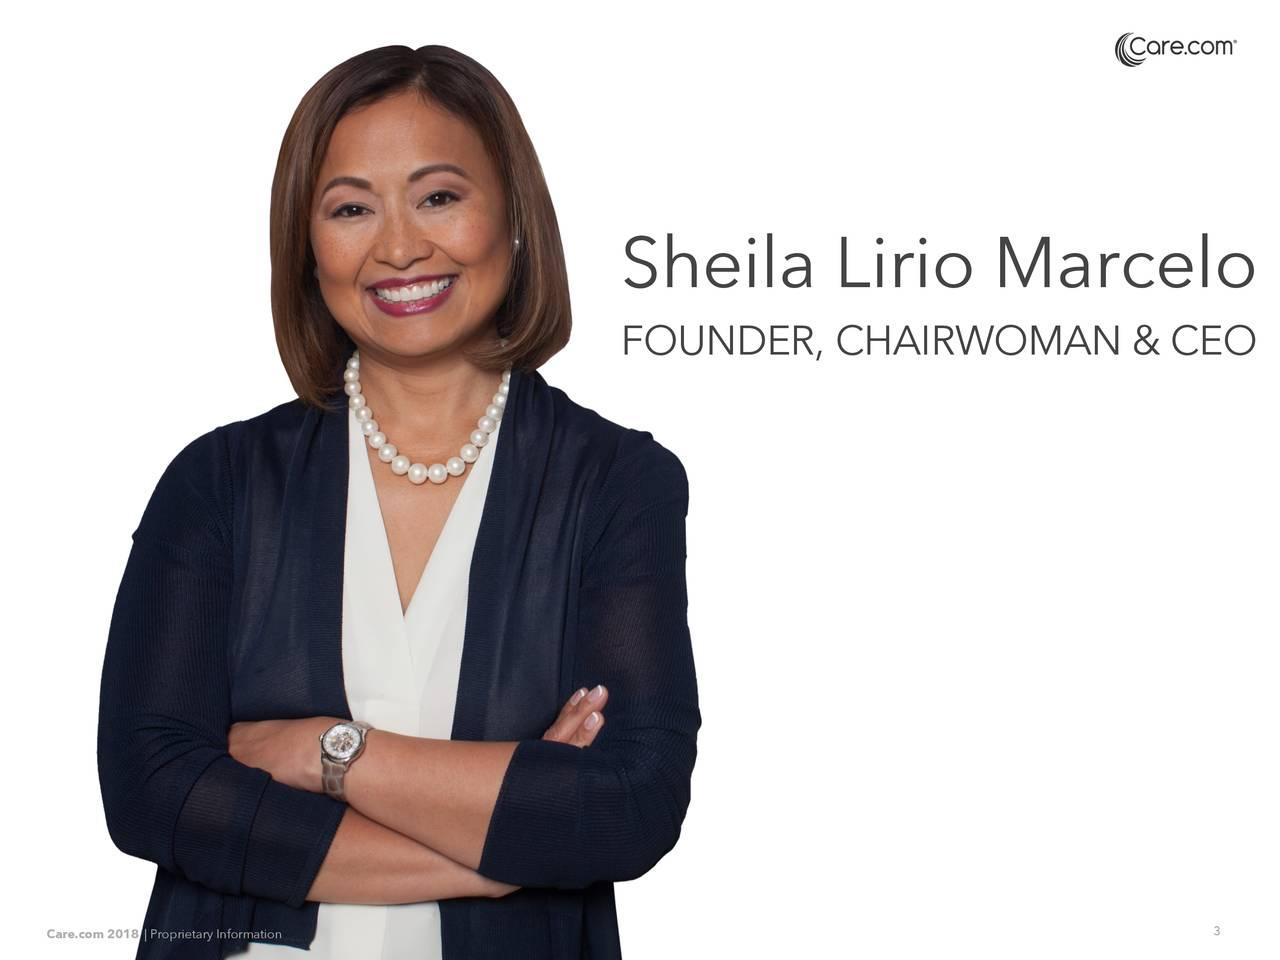 FOUNDER, CHAIRWOMAN & CEO Care.com 2018 |itarIfomaionno 3